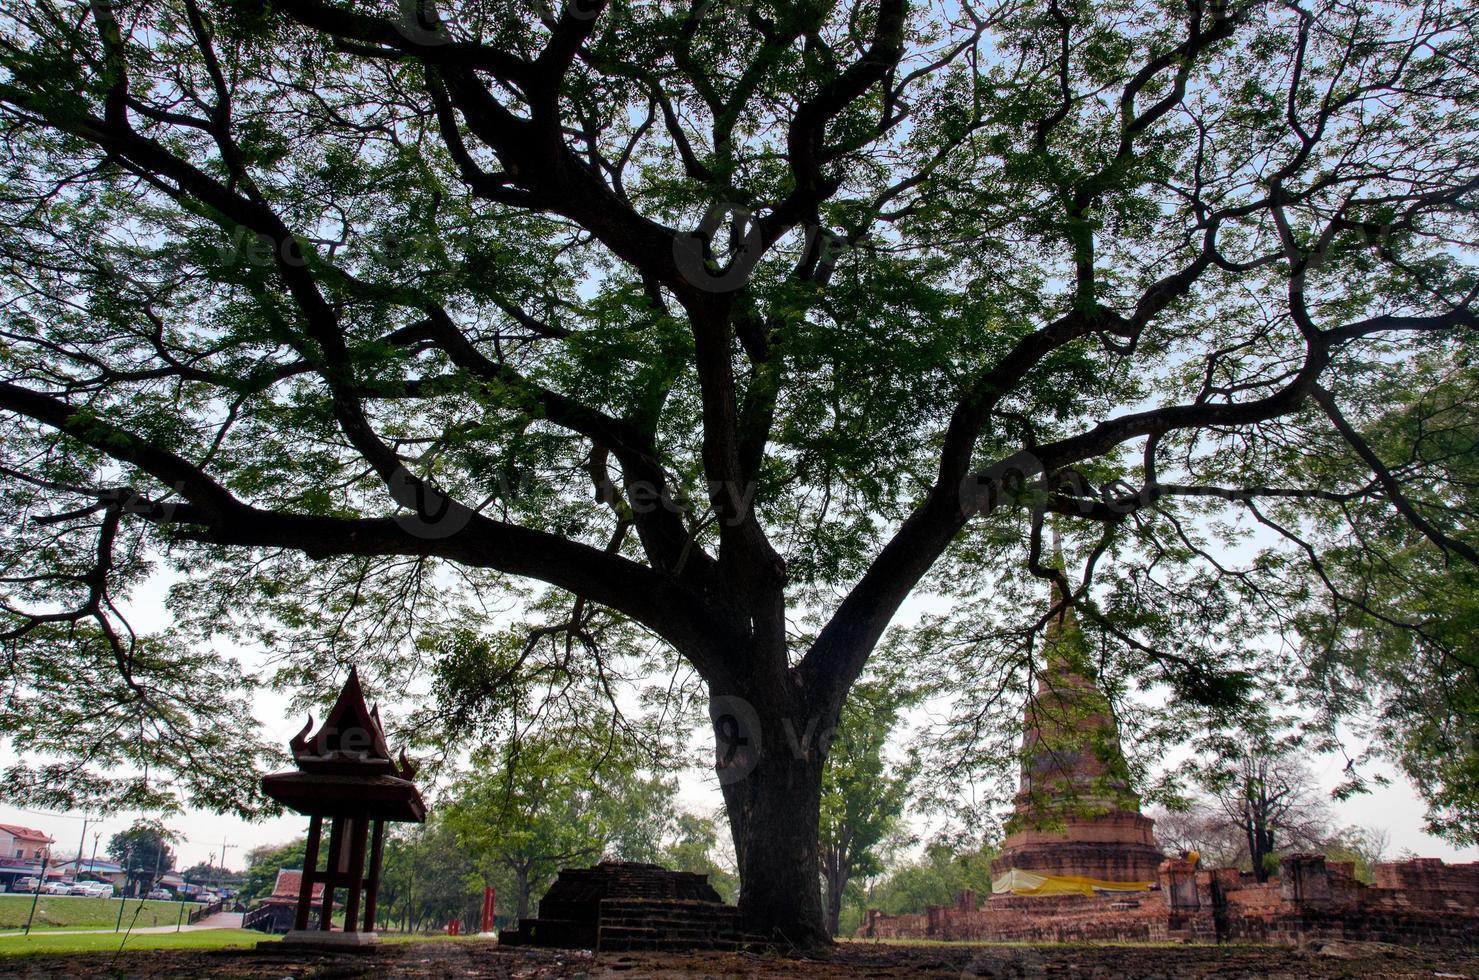 Big tree in Buddhist ancient temple photo